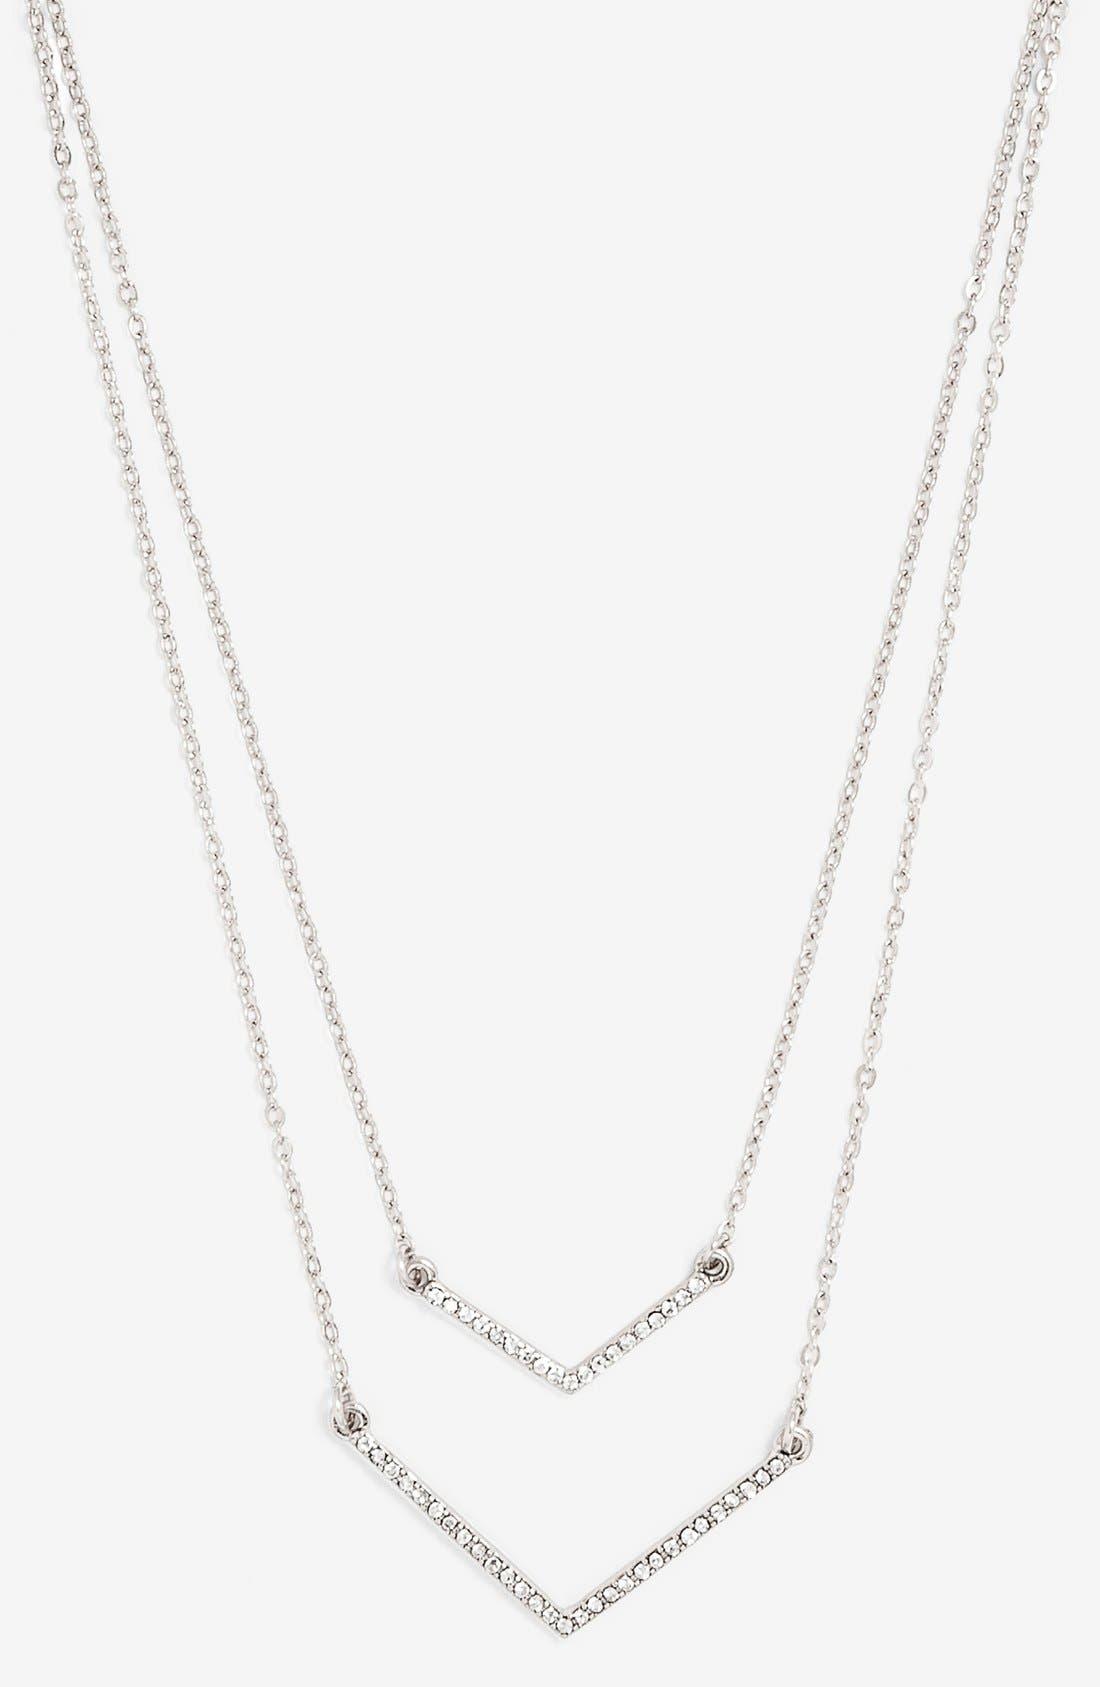 Alternate Image 1 Selected - BaubleBar Multistrand Pendant Necklace (Online Only)